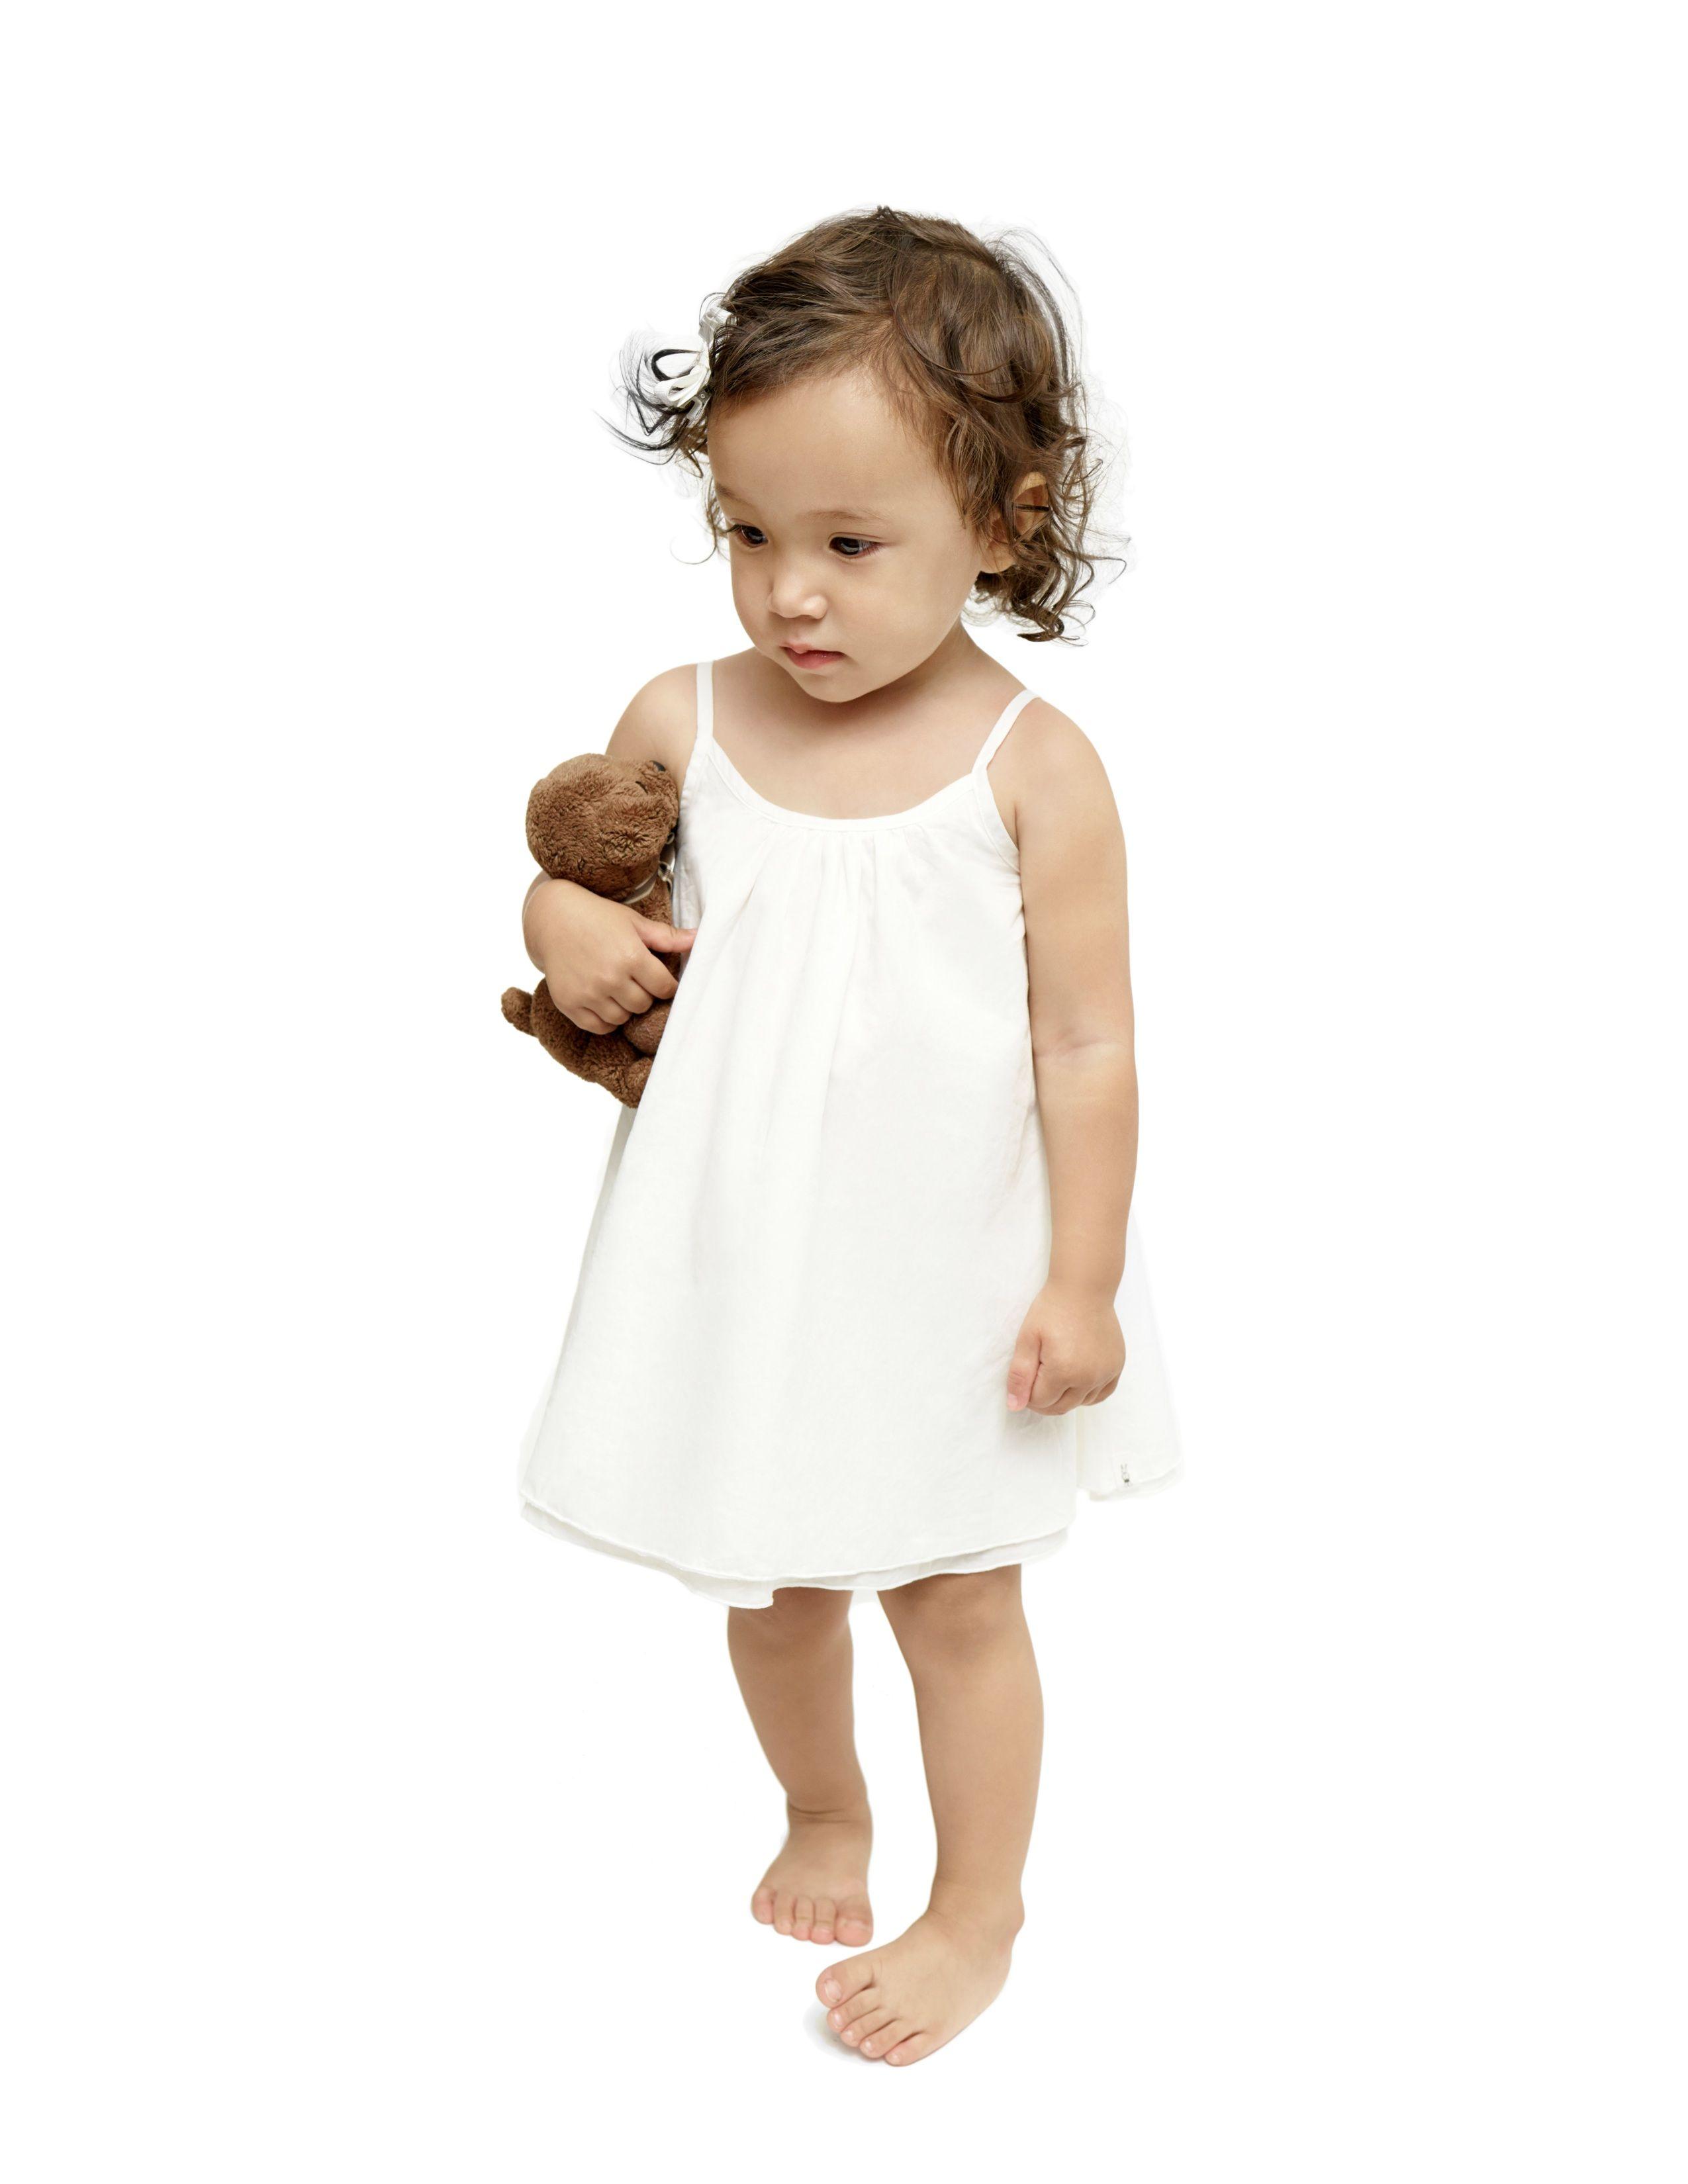 ZAIKAMOYA The Best Baby Kids Clothing Brands Pinterest